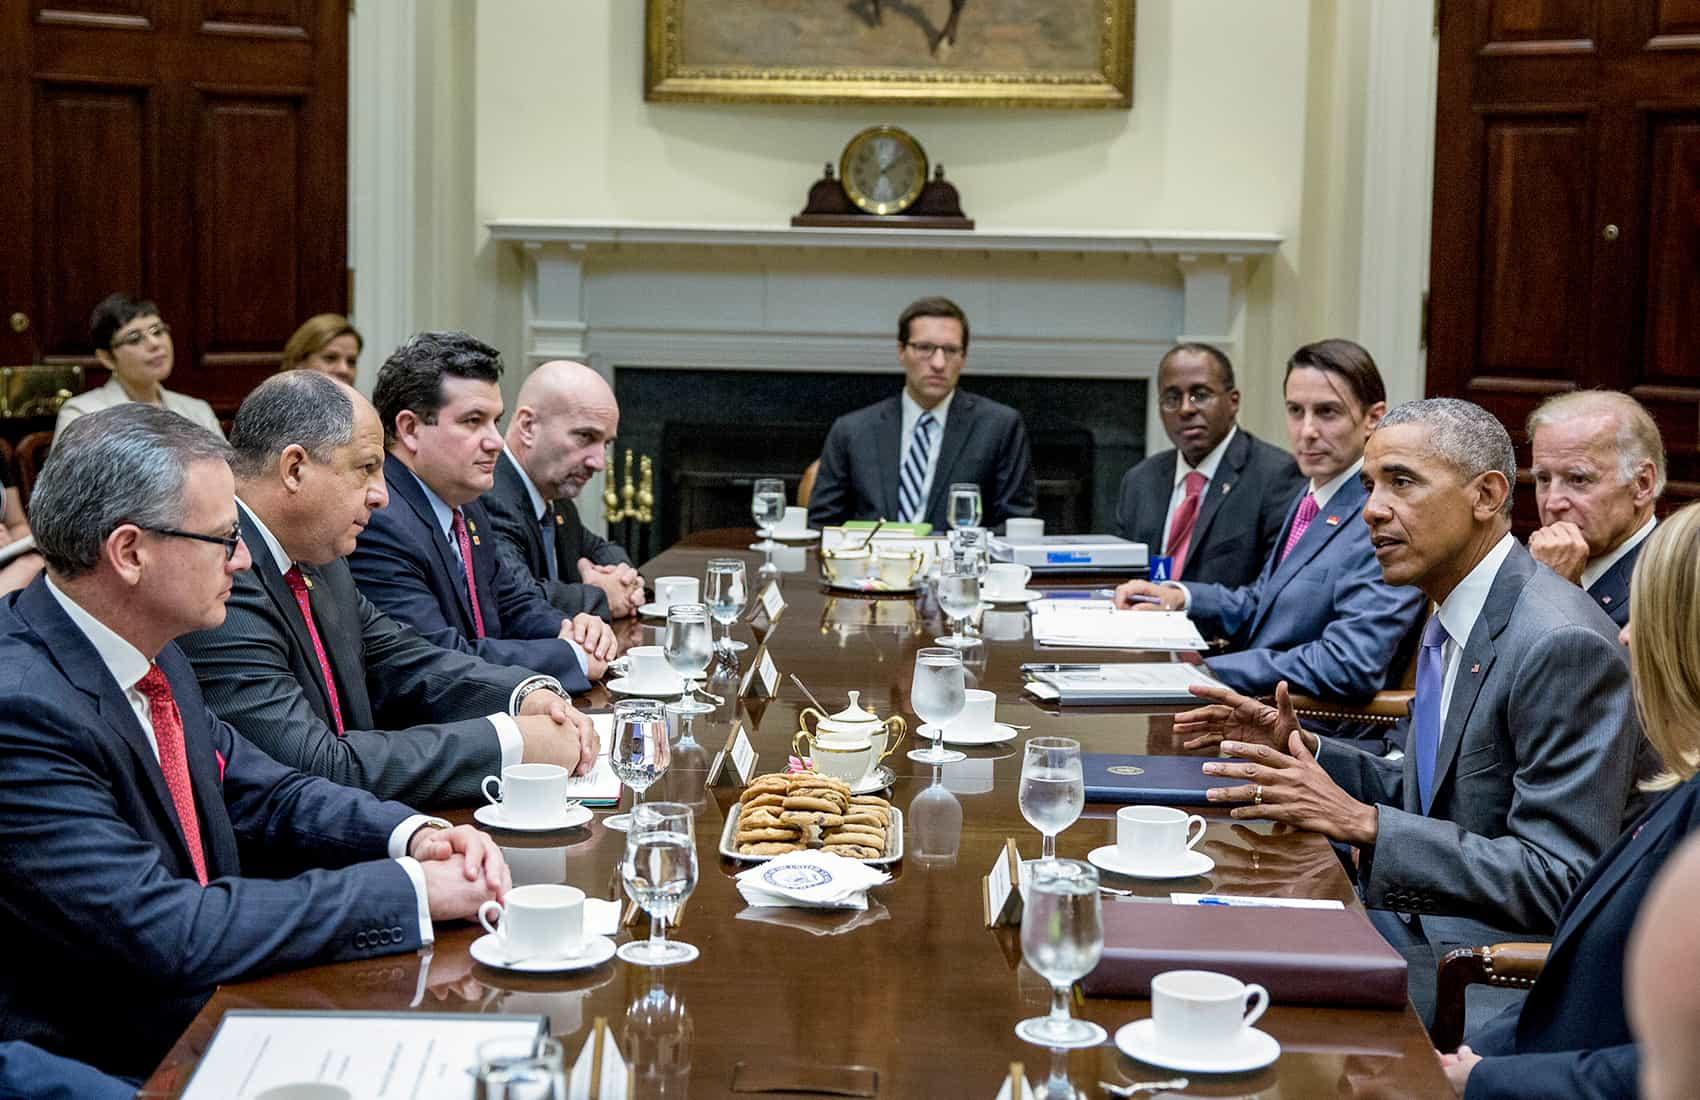 President Luis Guillermo Solís meeting with President Barack Obama, VP Joe Biden. Aug. 22, 2016.